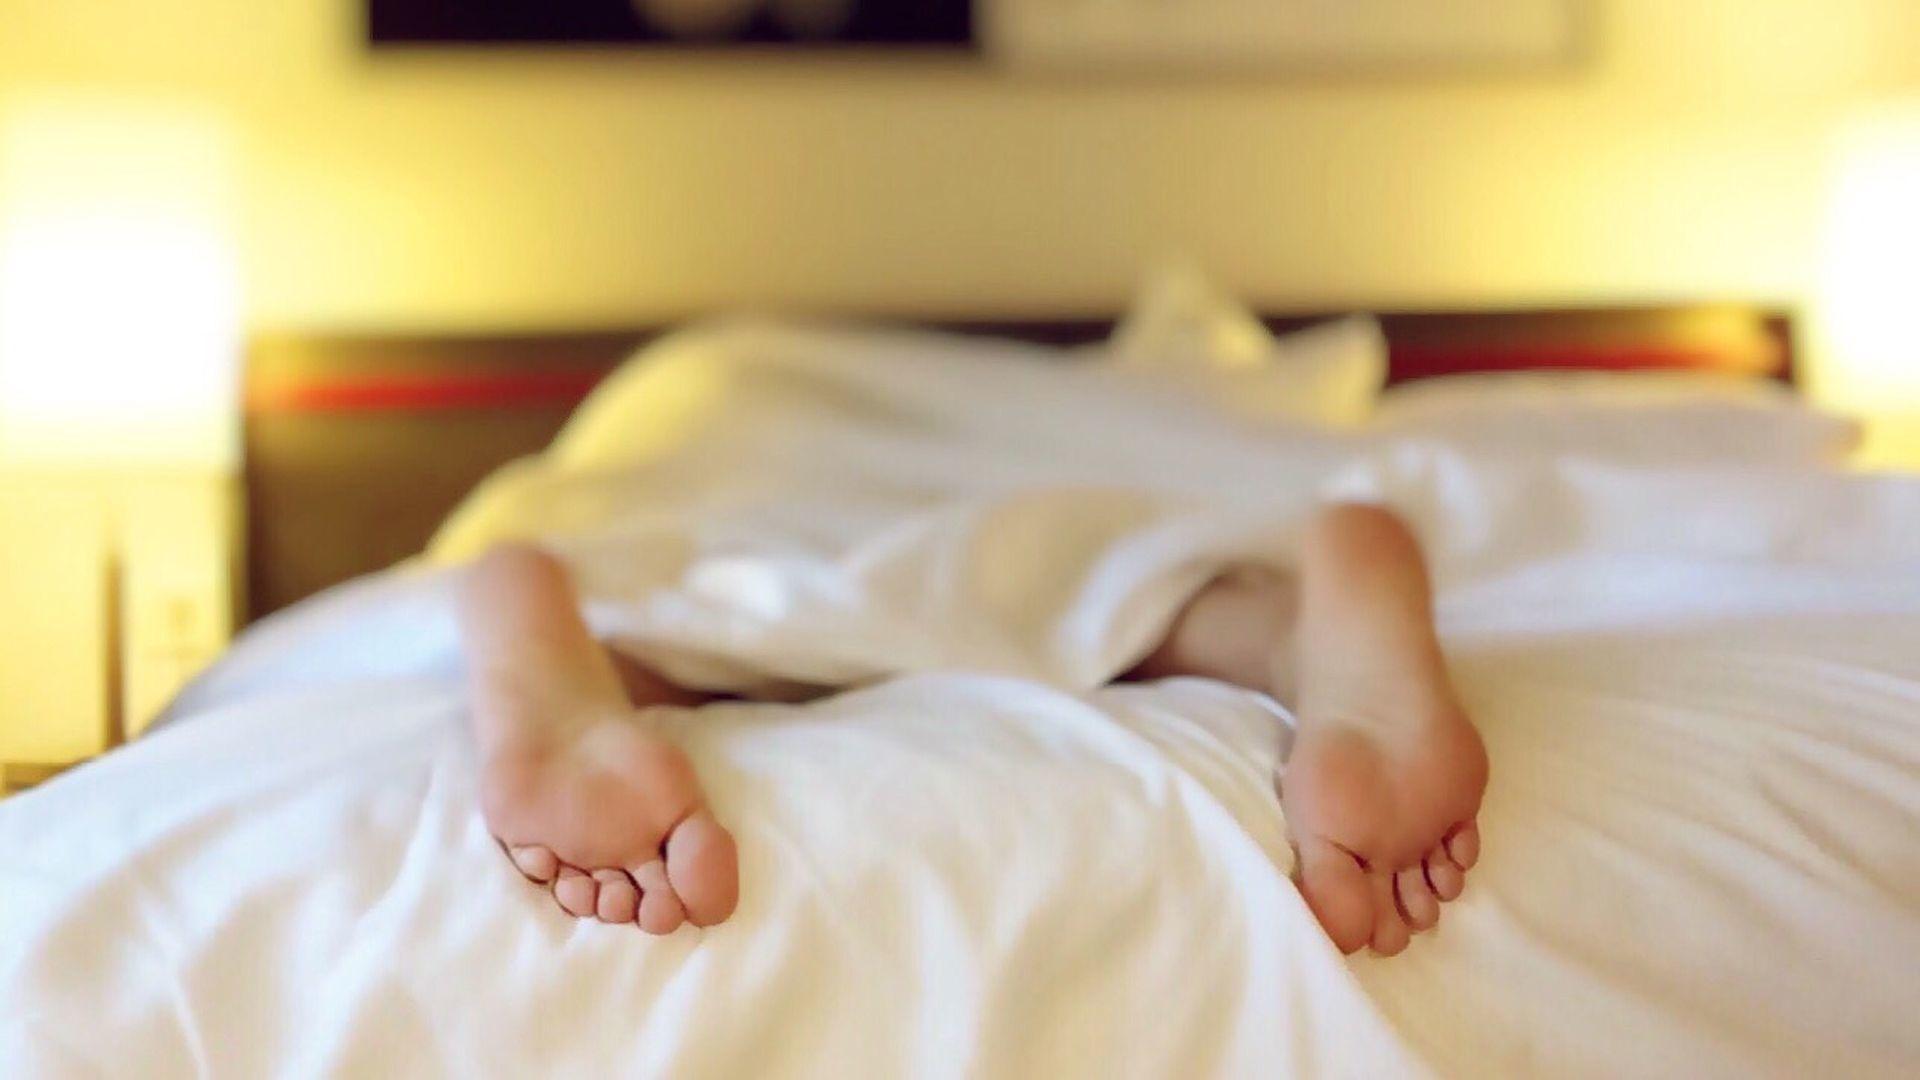 Wat Is Het Beste Bed Om In Te Slapen.Slaapweetjes 35 Feitjes Om Beter Te Slapen